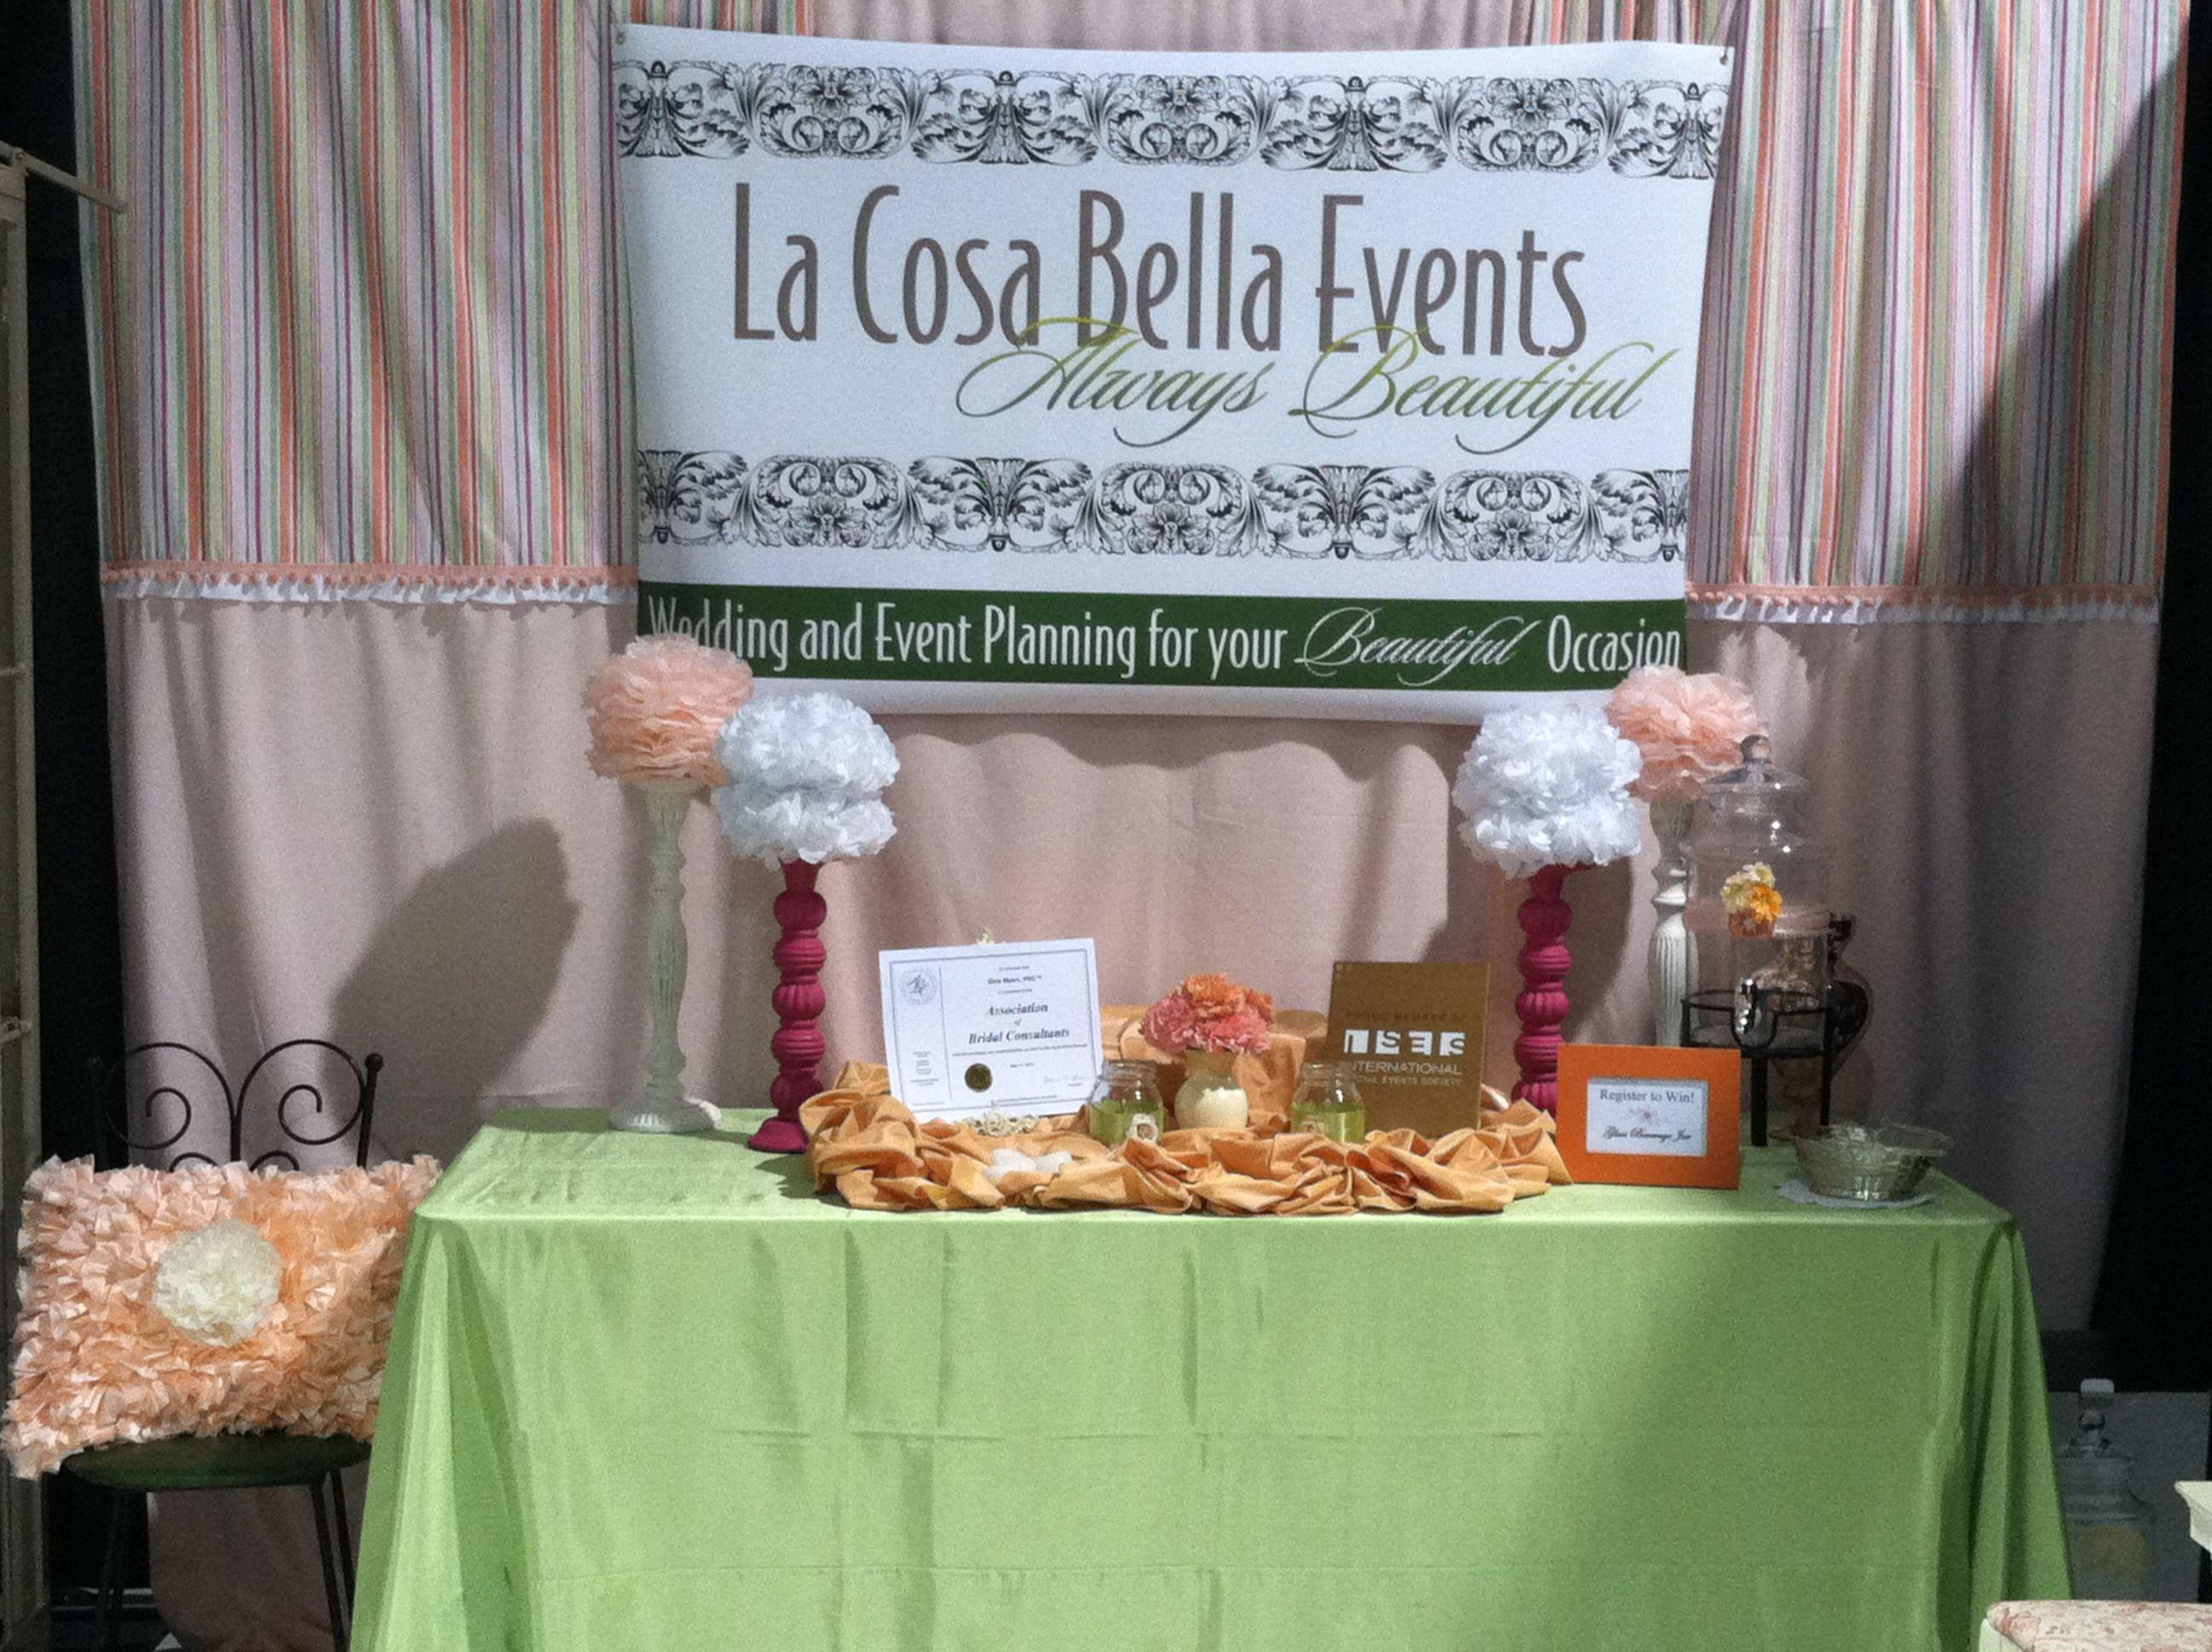 Wedding Planner Bridal Show Booth Ideas : Wedding planner bridal show booth ideas google search